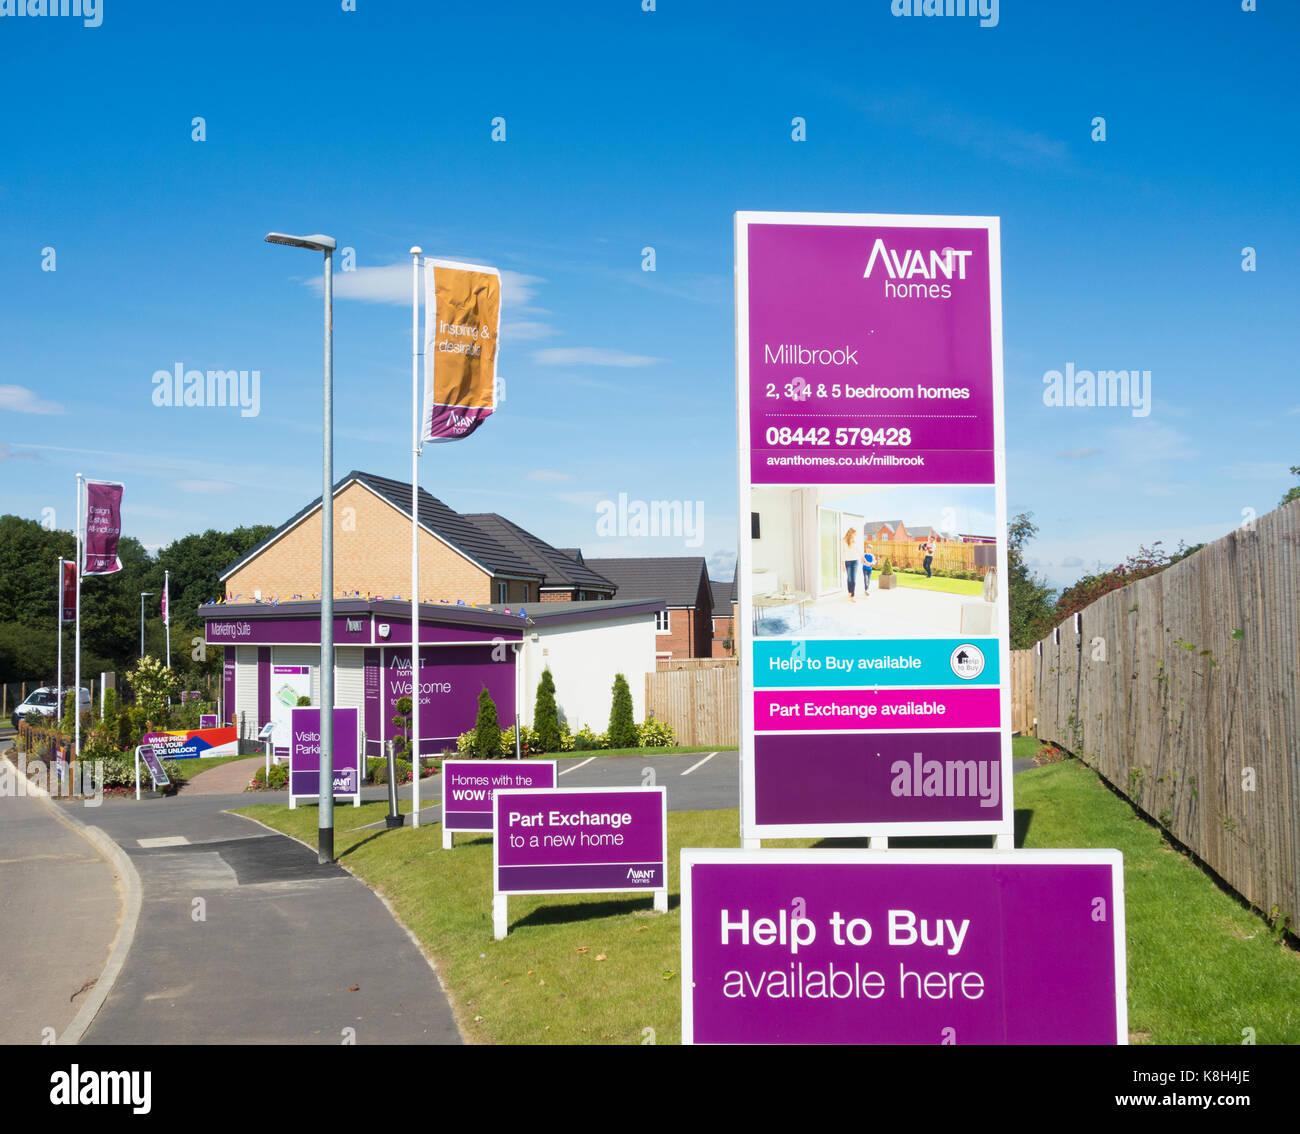 Avant Homes - Stock Image